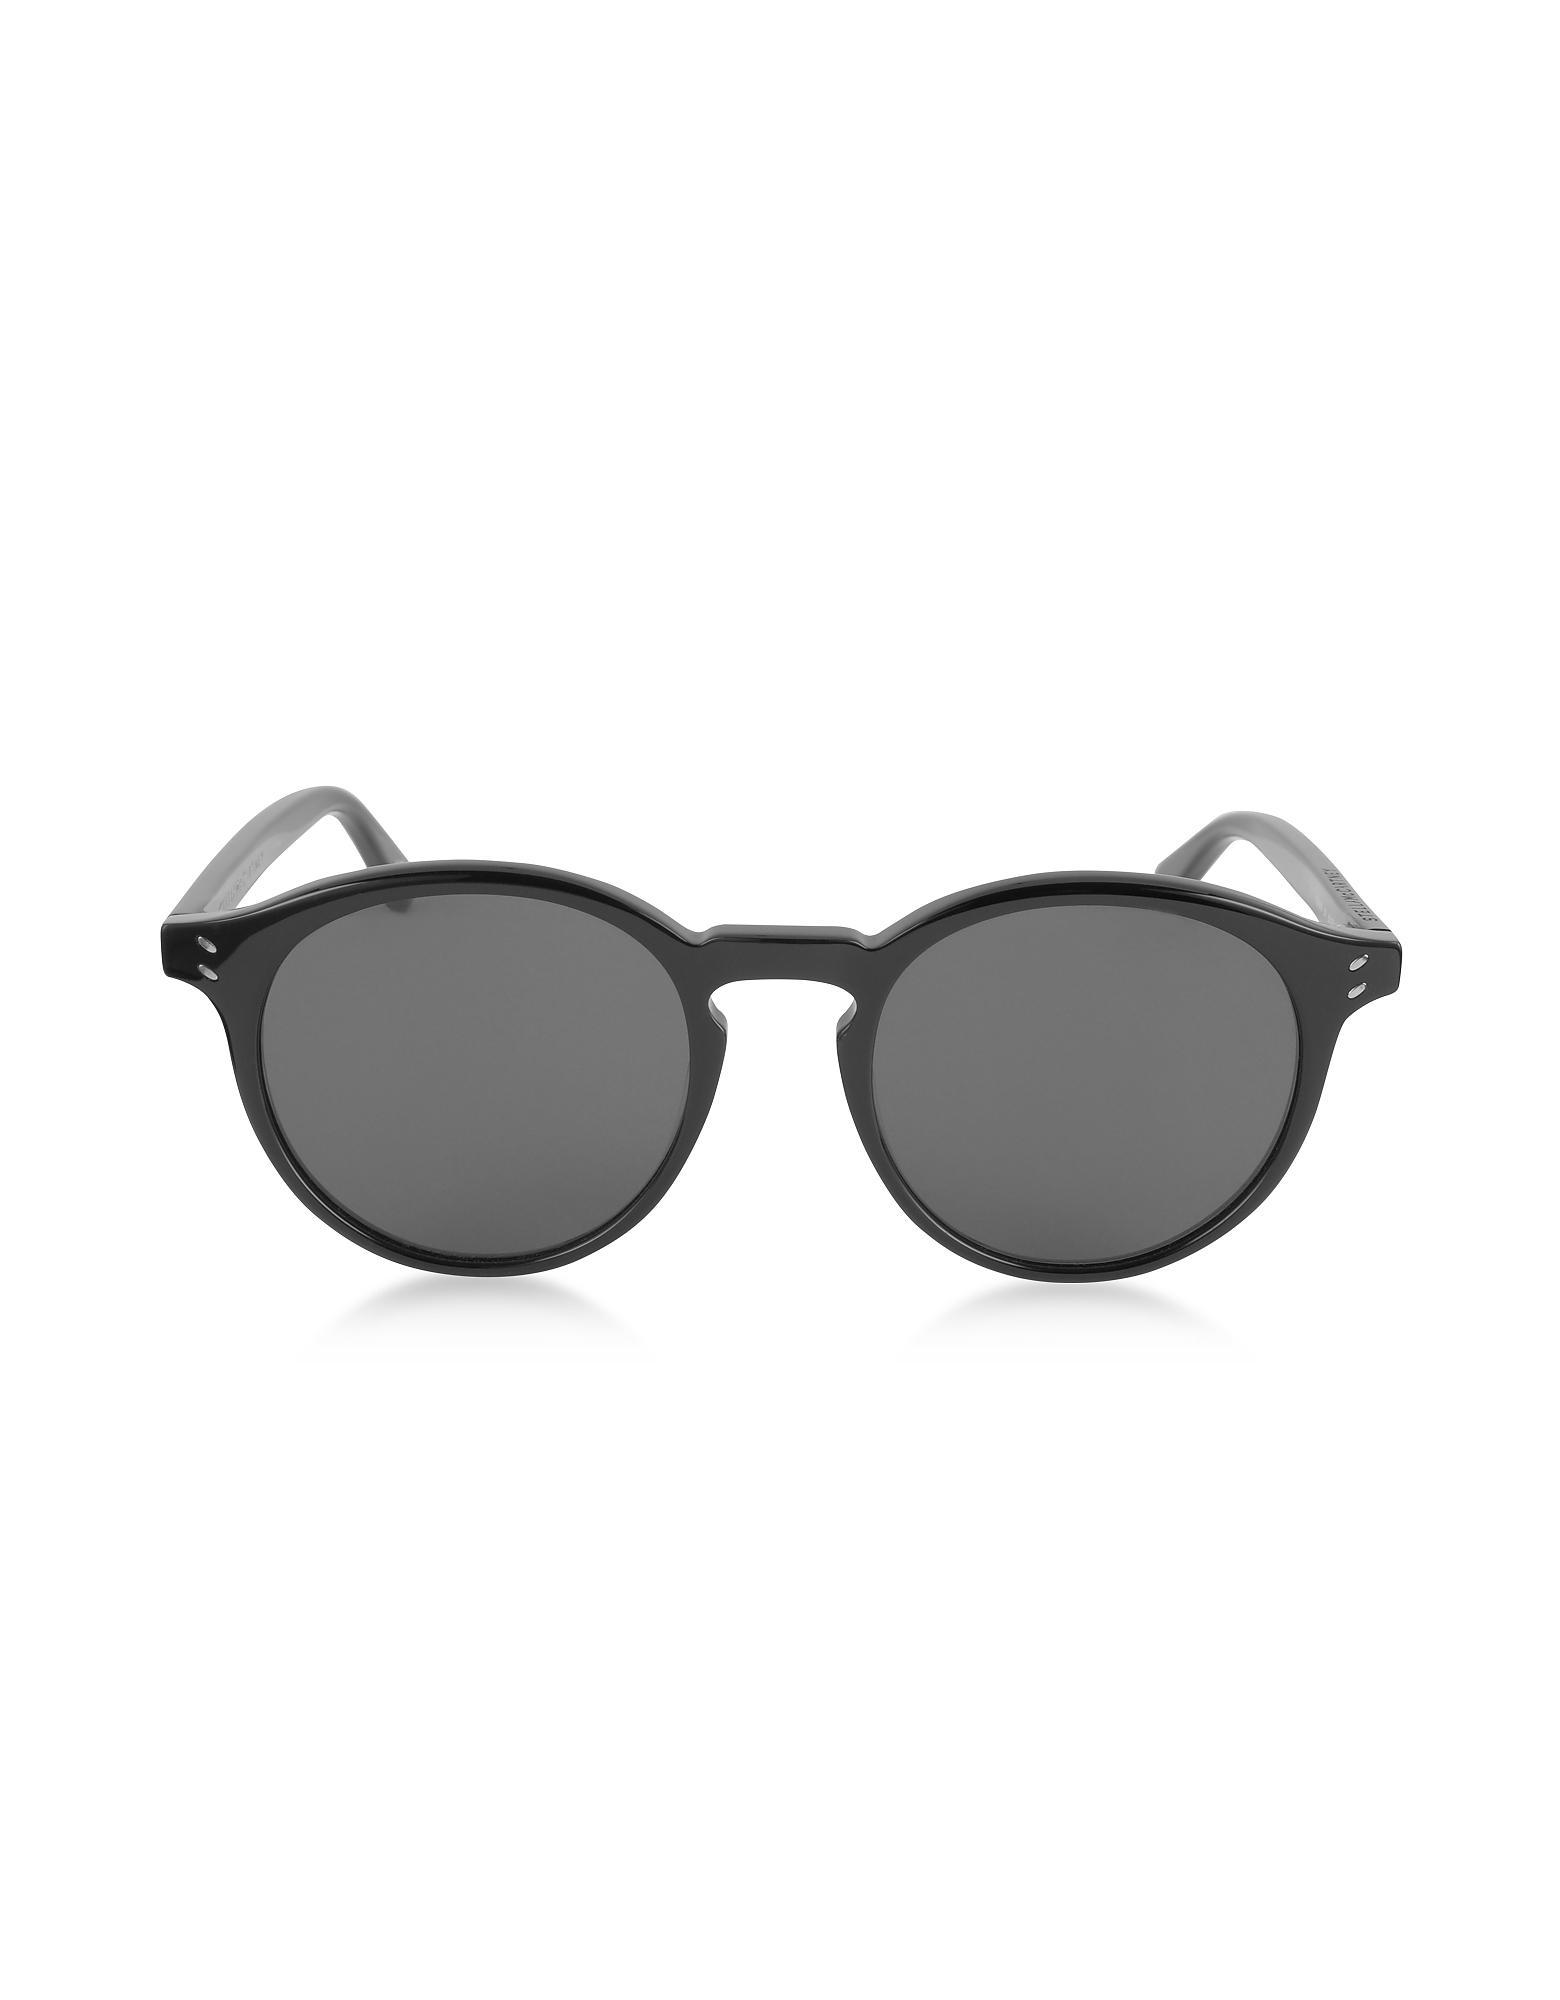 267649b8d3 Stella Mccartney Sc0069s Round Acetate Men s Sunglasses in Black for ...